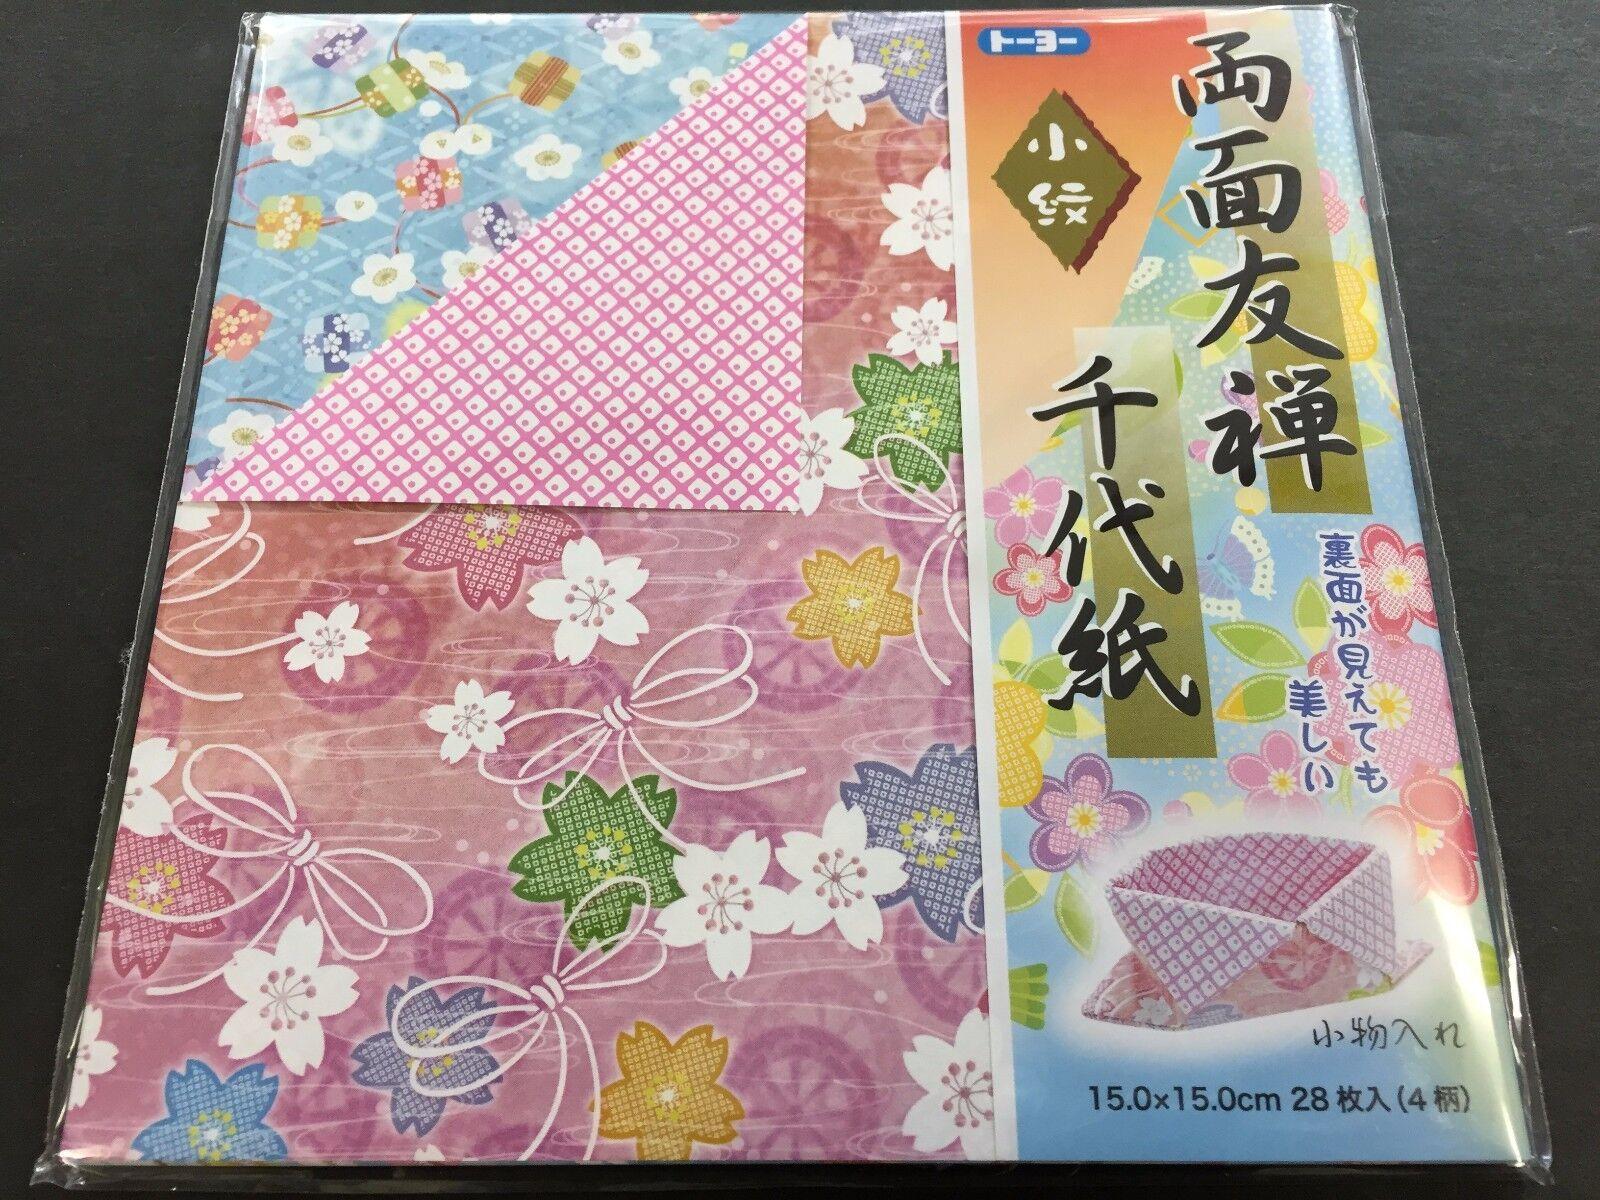 Toyo origami paper yuzen washi chiyogami style 28 sheets 4 designs picture 1 of 4 jeuxipadfo Images